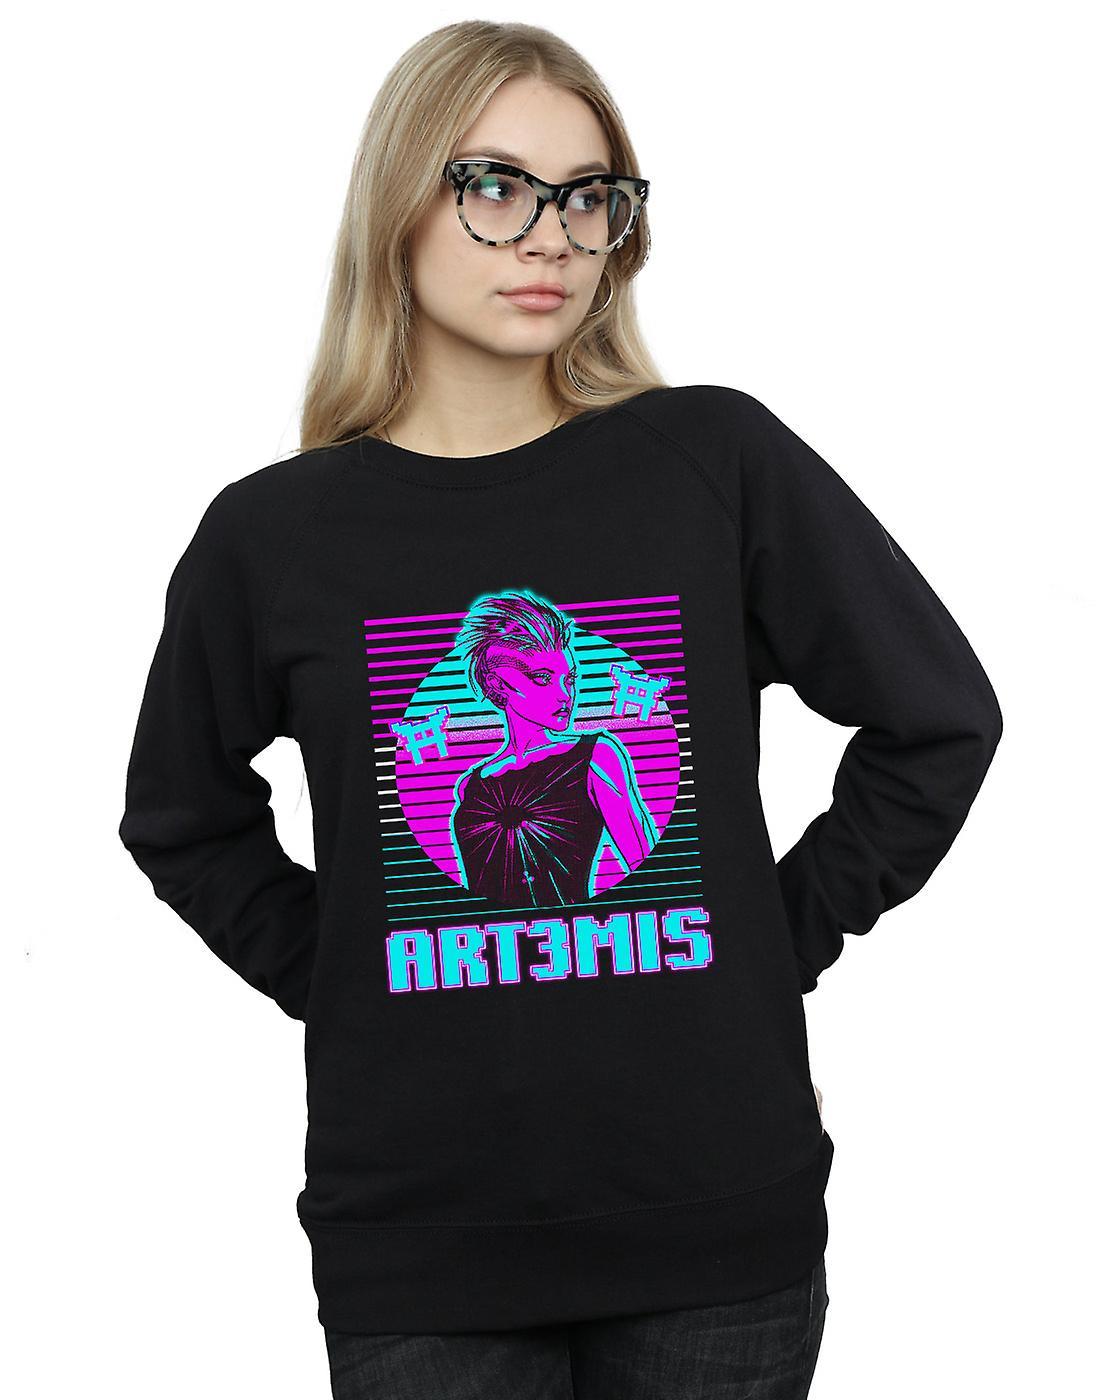 Ready Player One Women's Neon Art3mis Sweatshirt